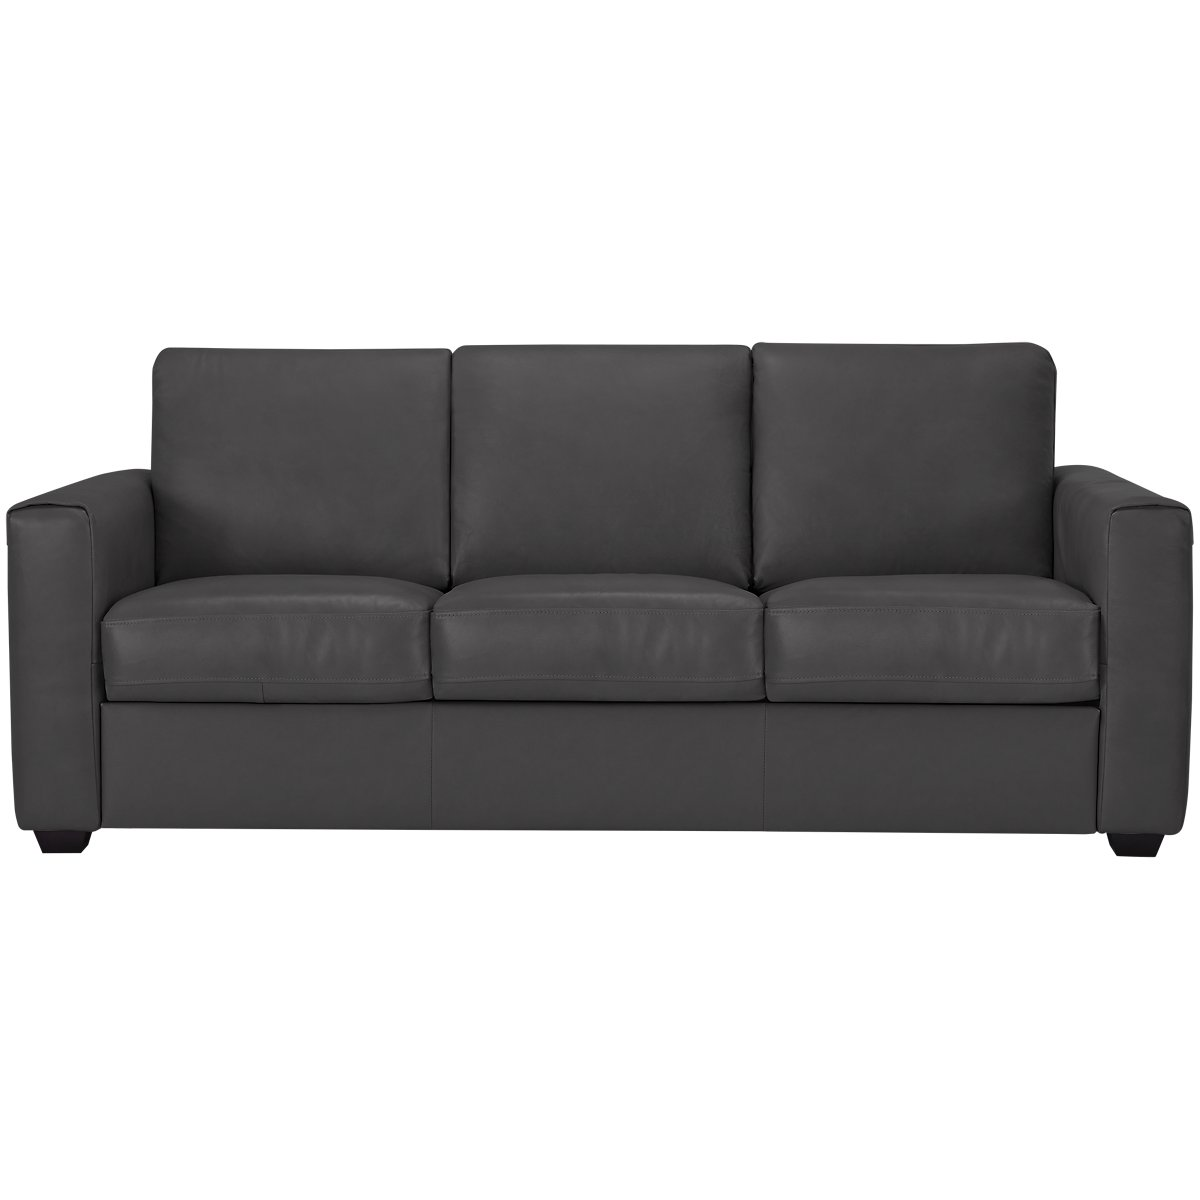 Lane Dark Gray Leather & Vinyl Sofa